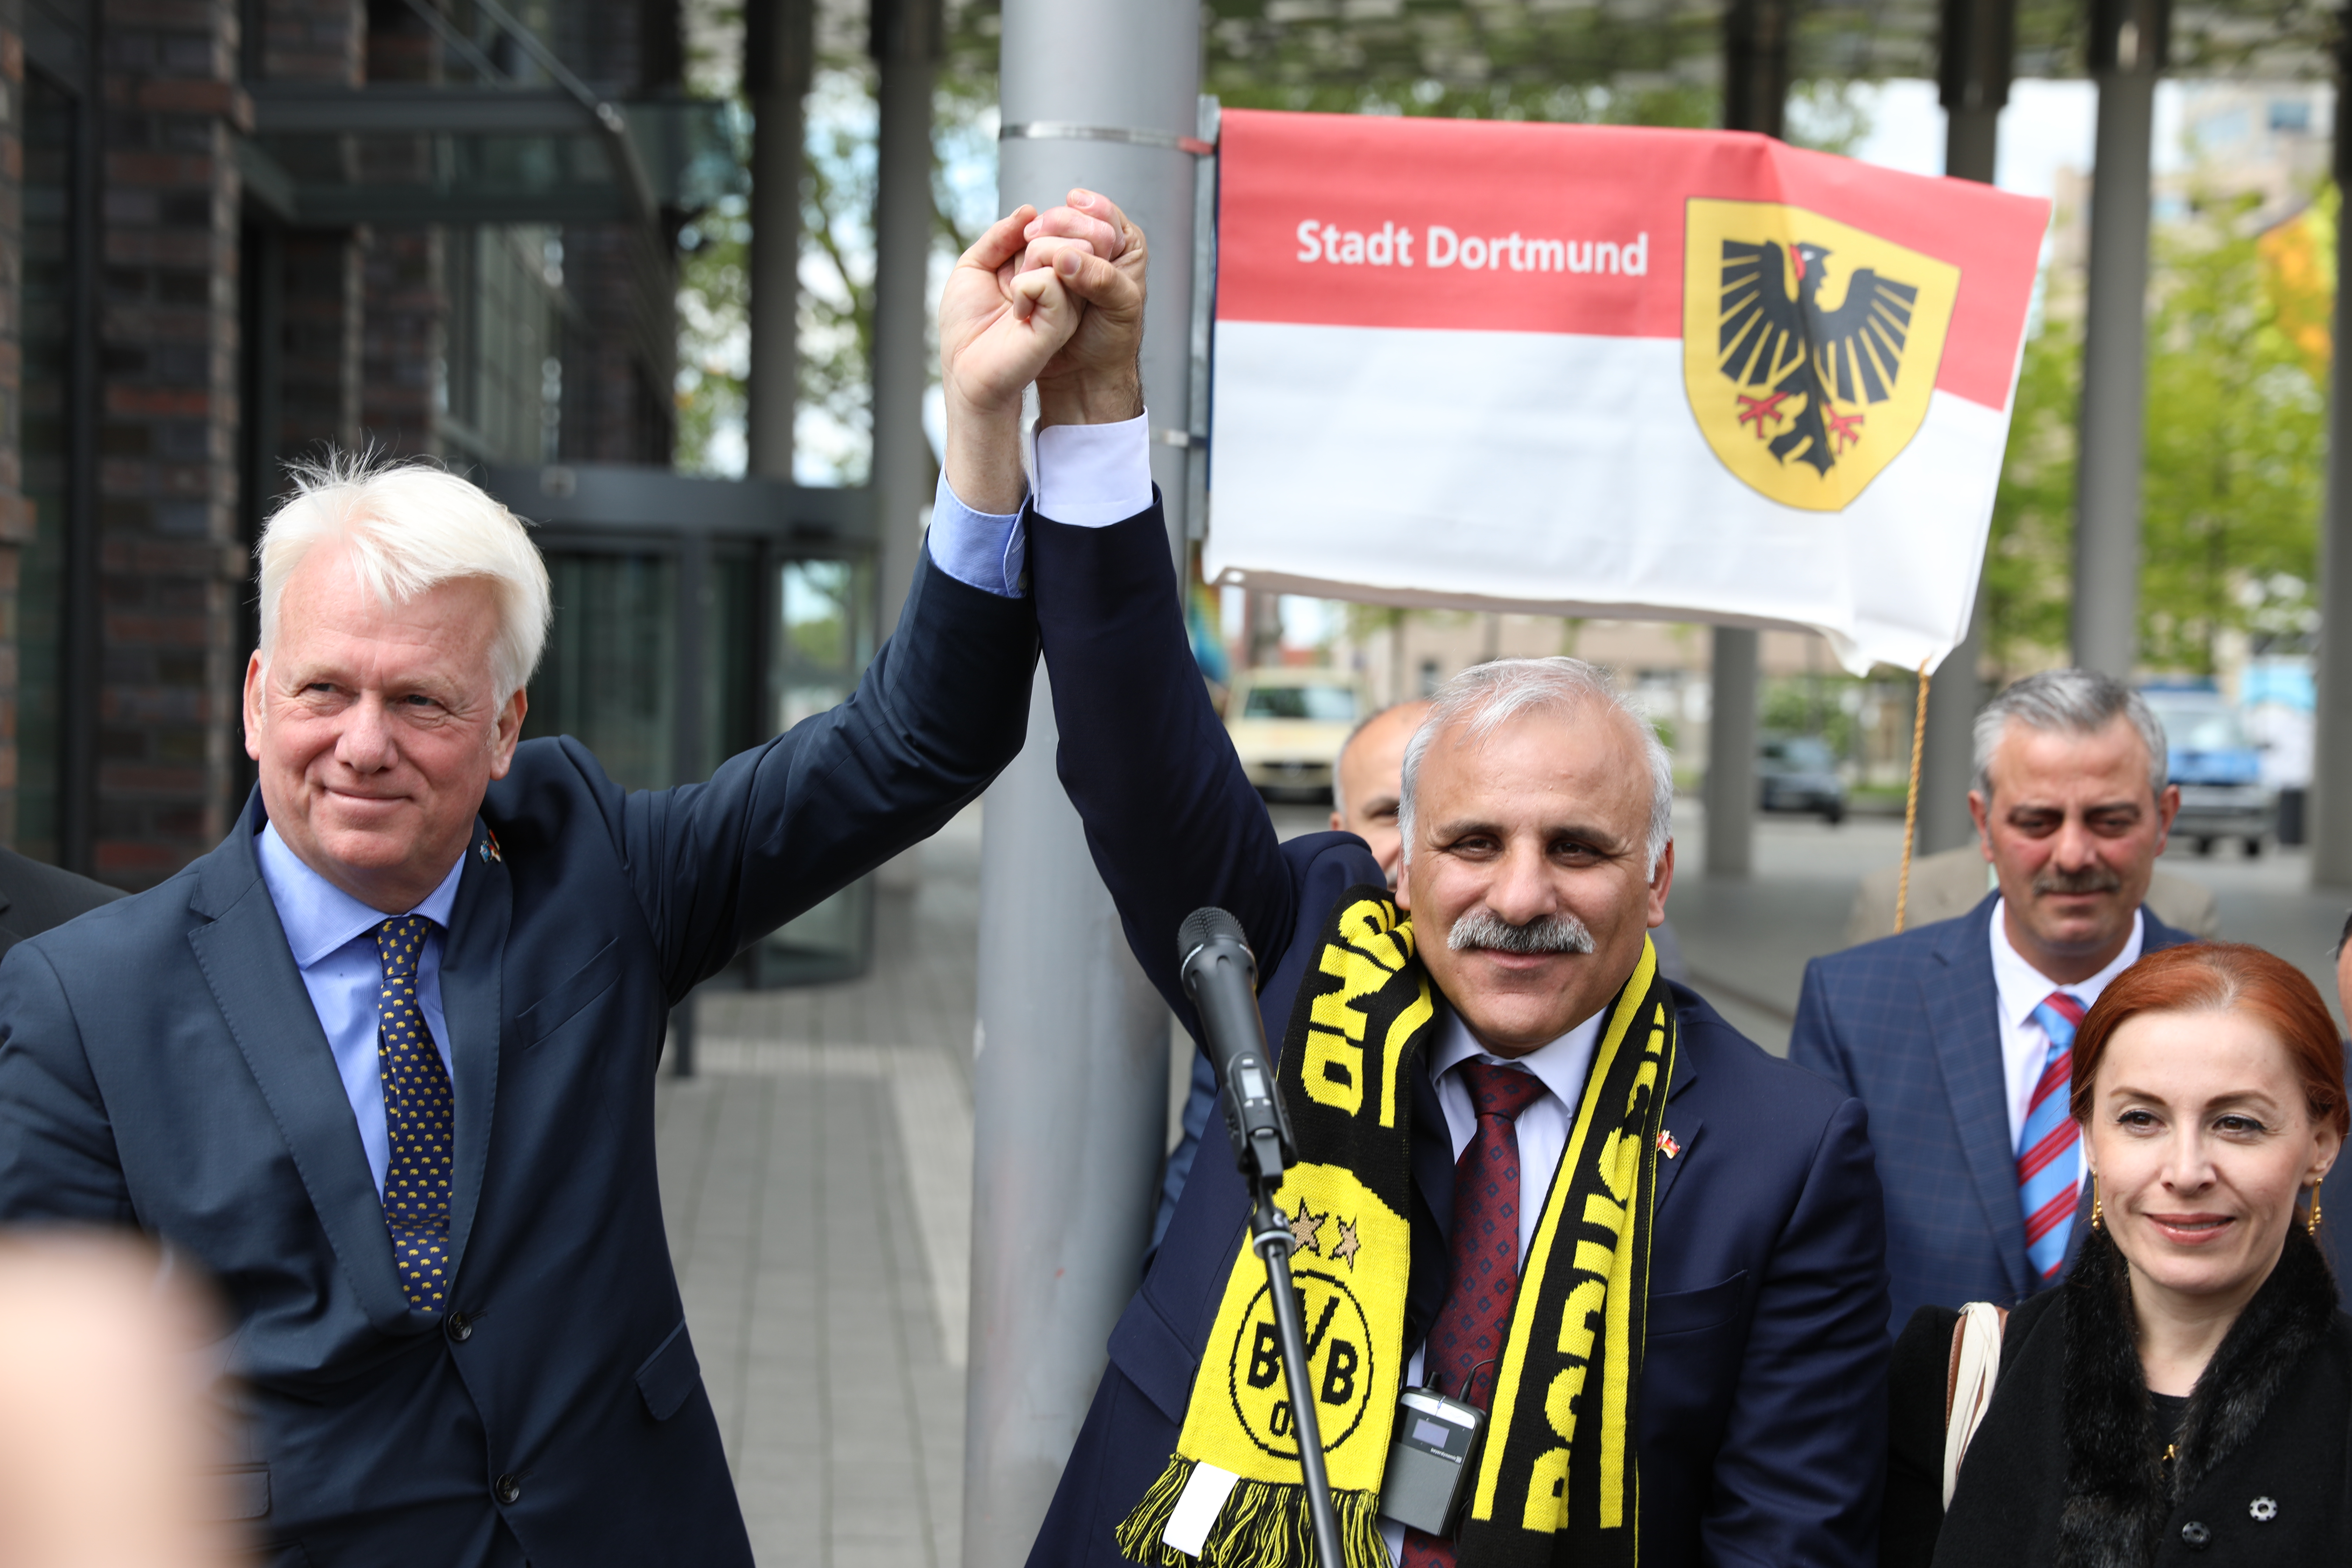 Dortmund'da Trabzon Meydanı